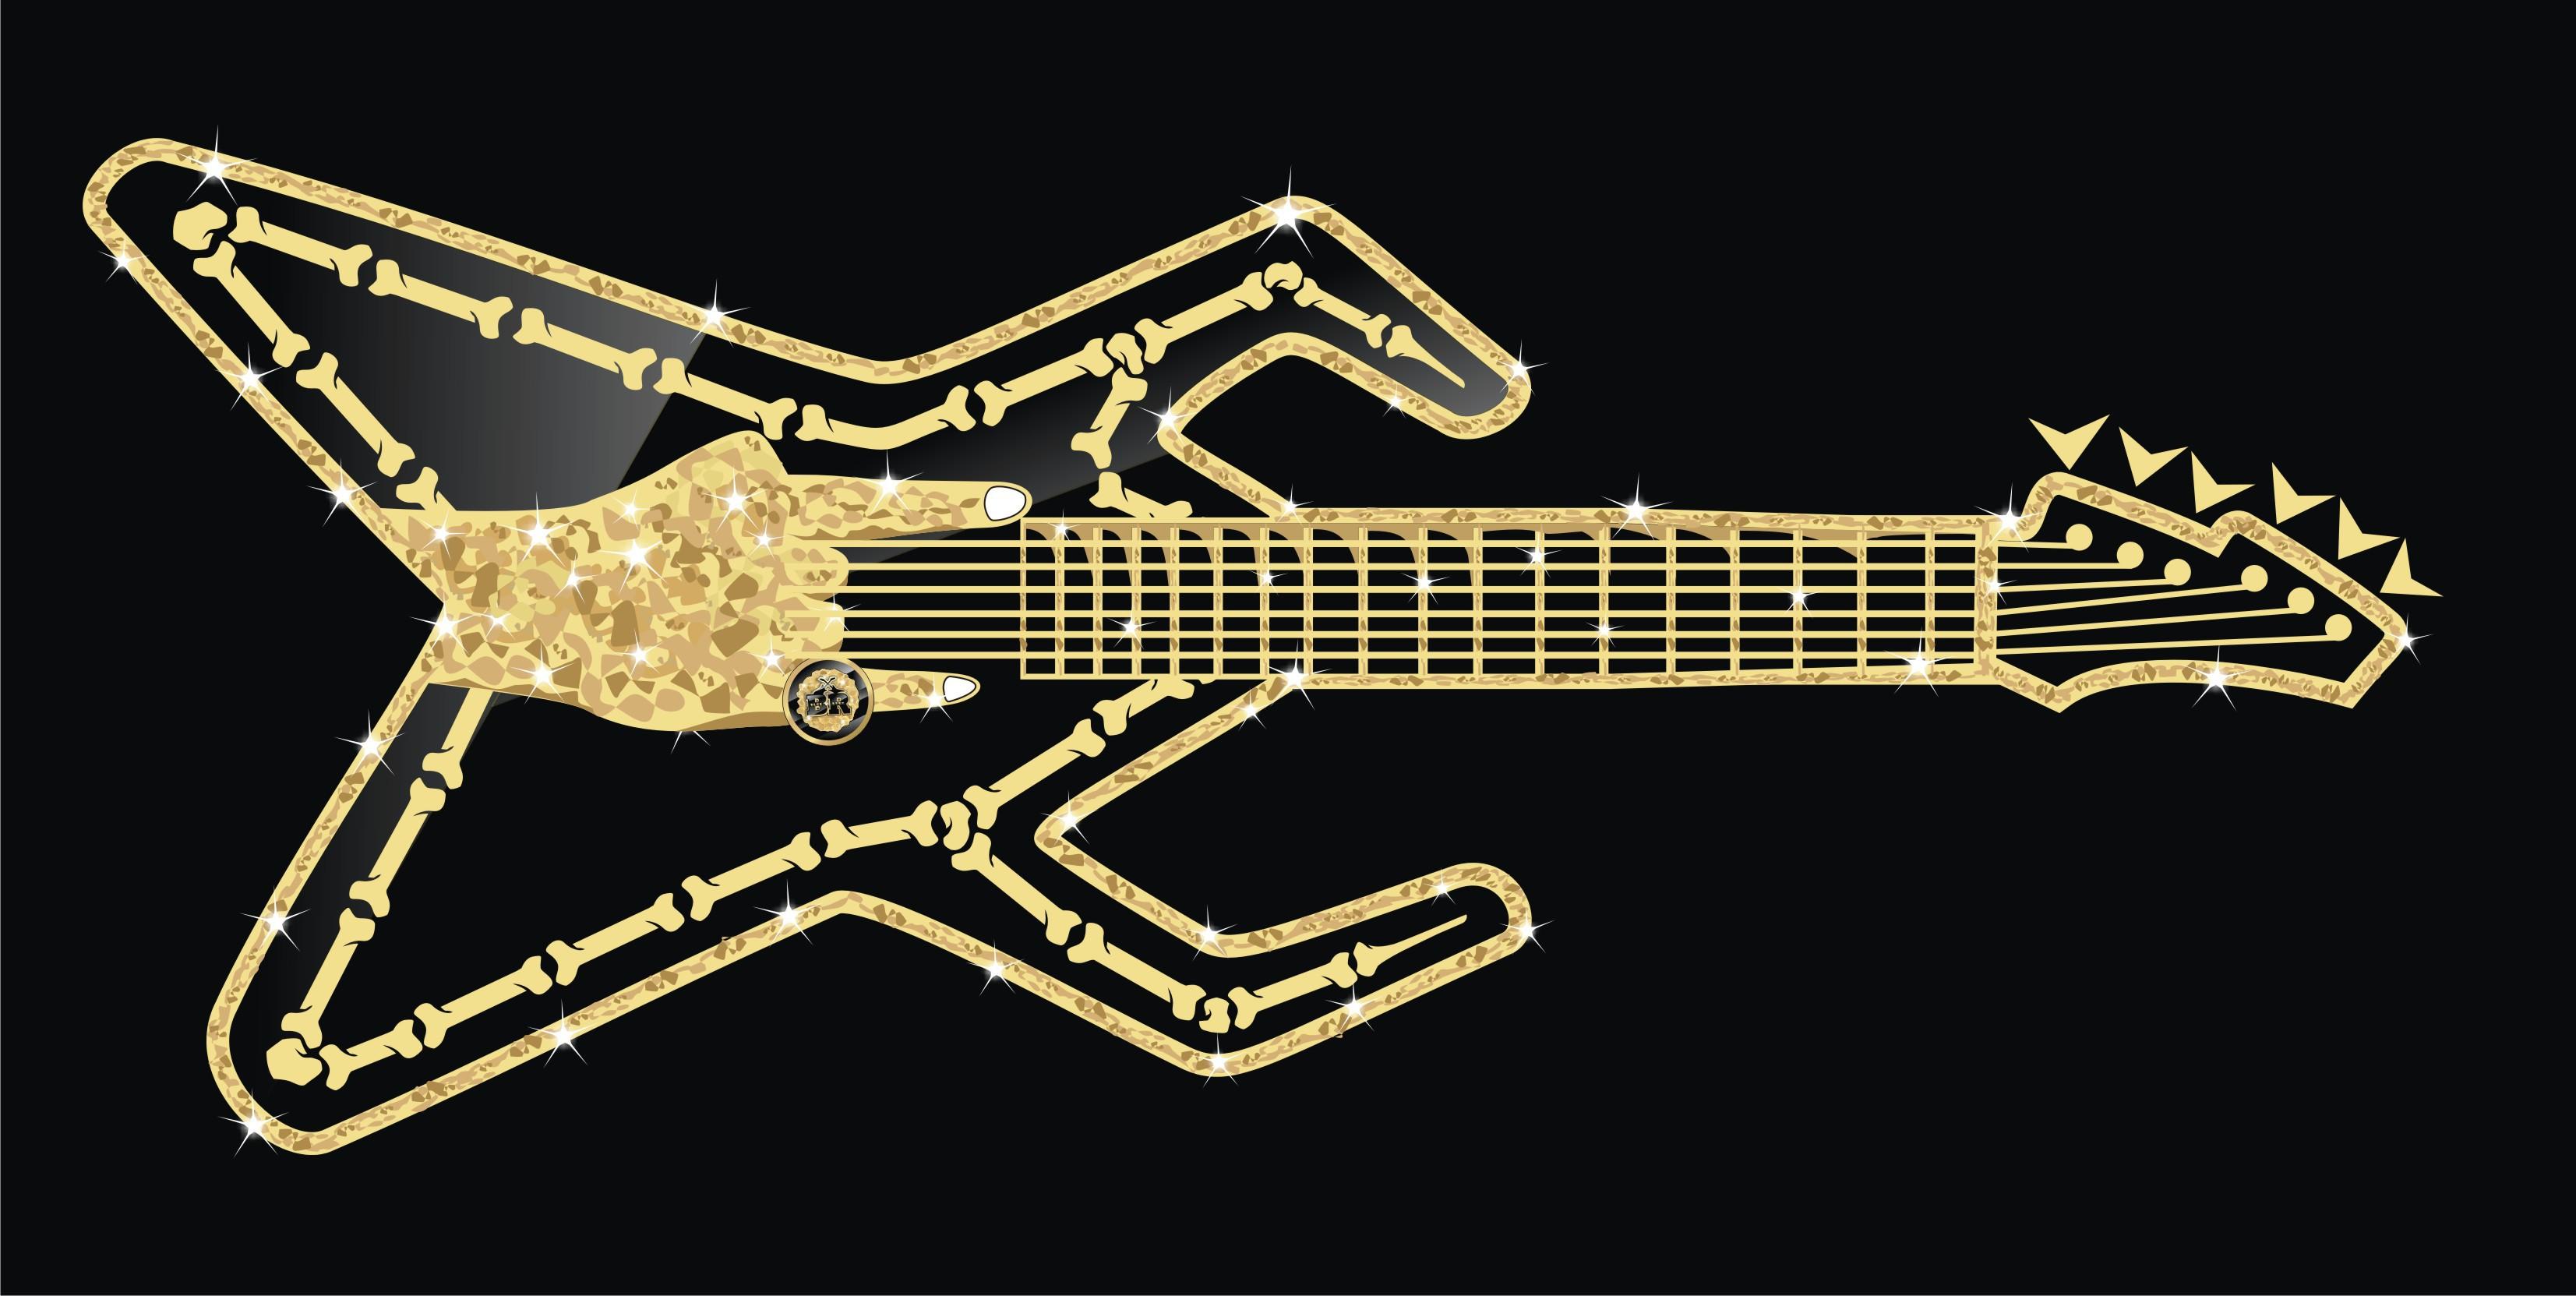 Br guitar for apparel